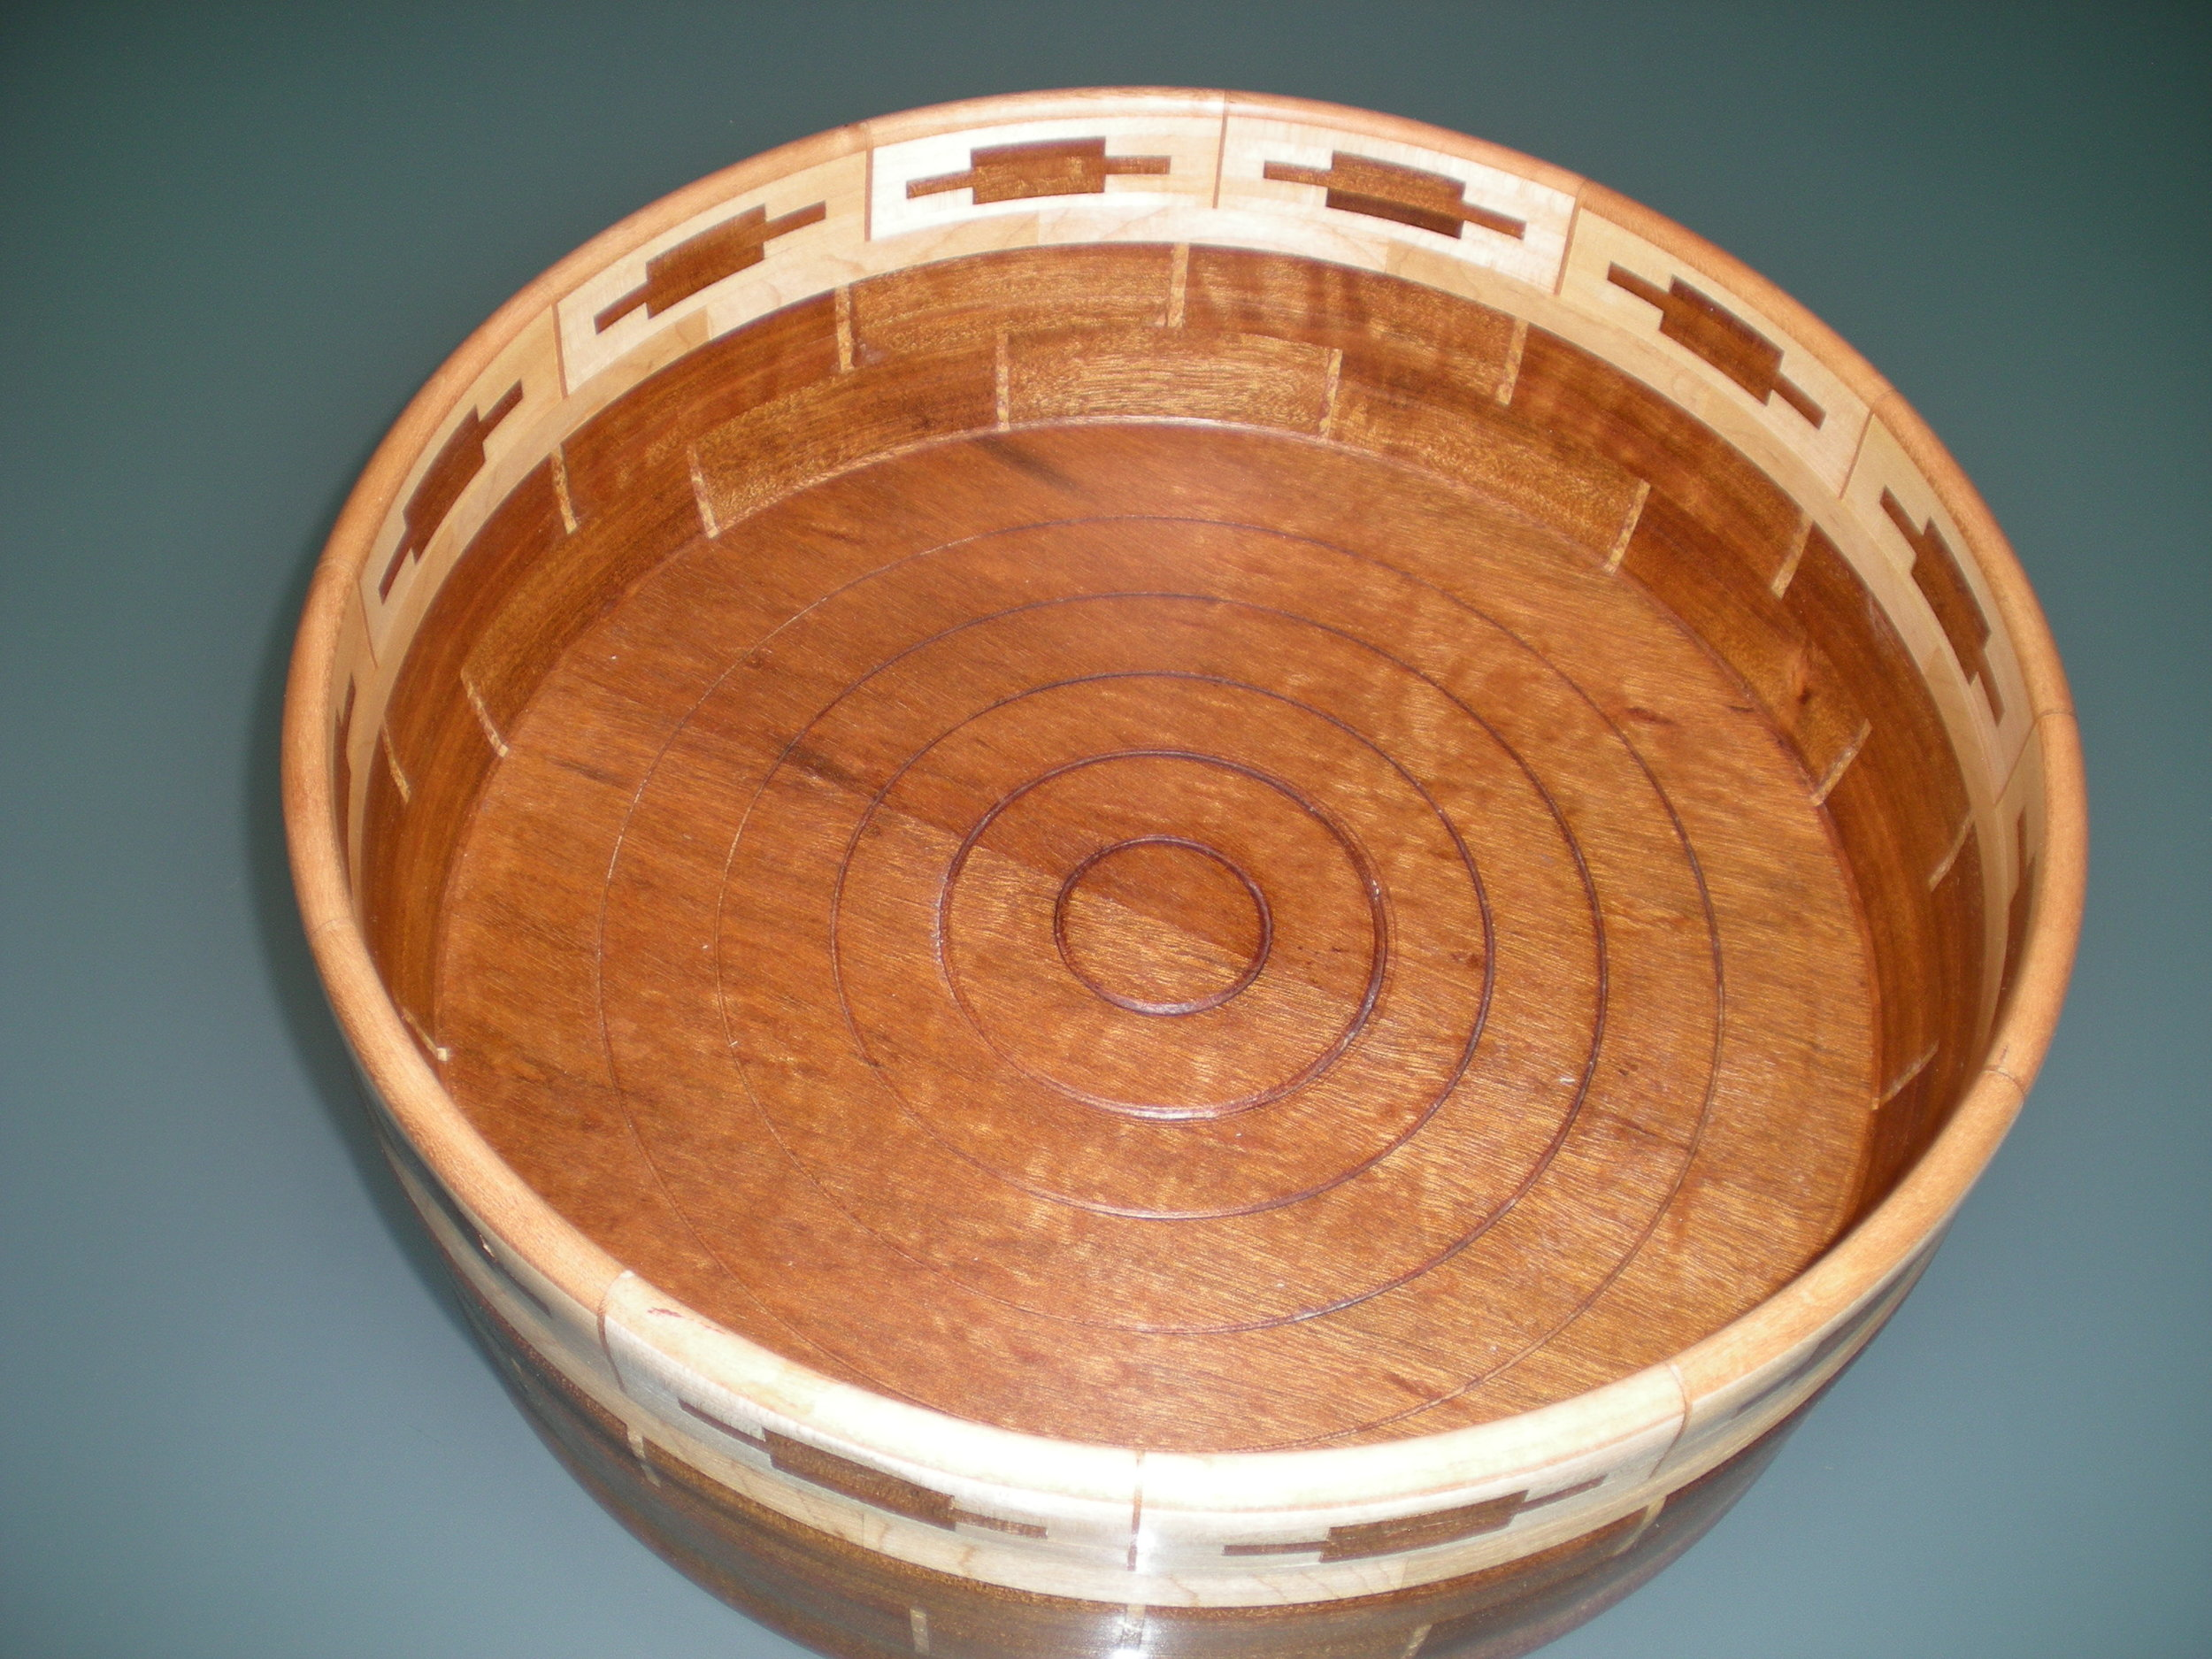 RJC Wood Creations - Bowls (30).JPG